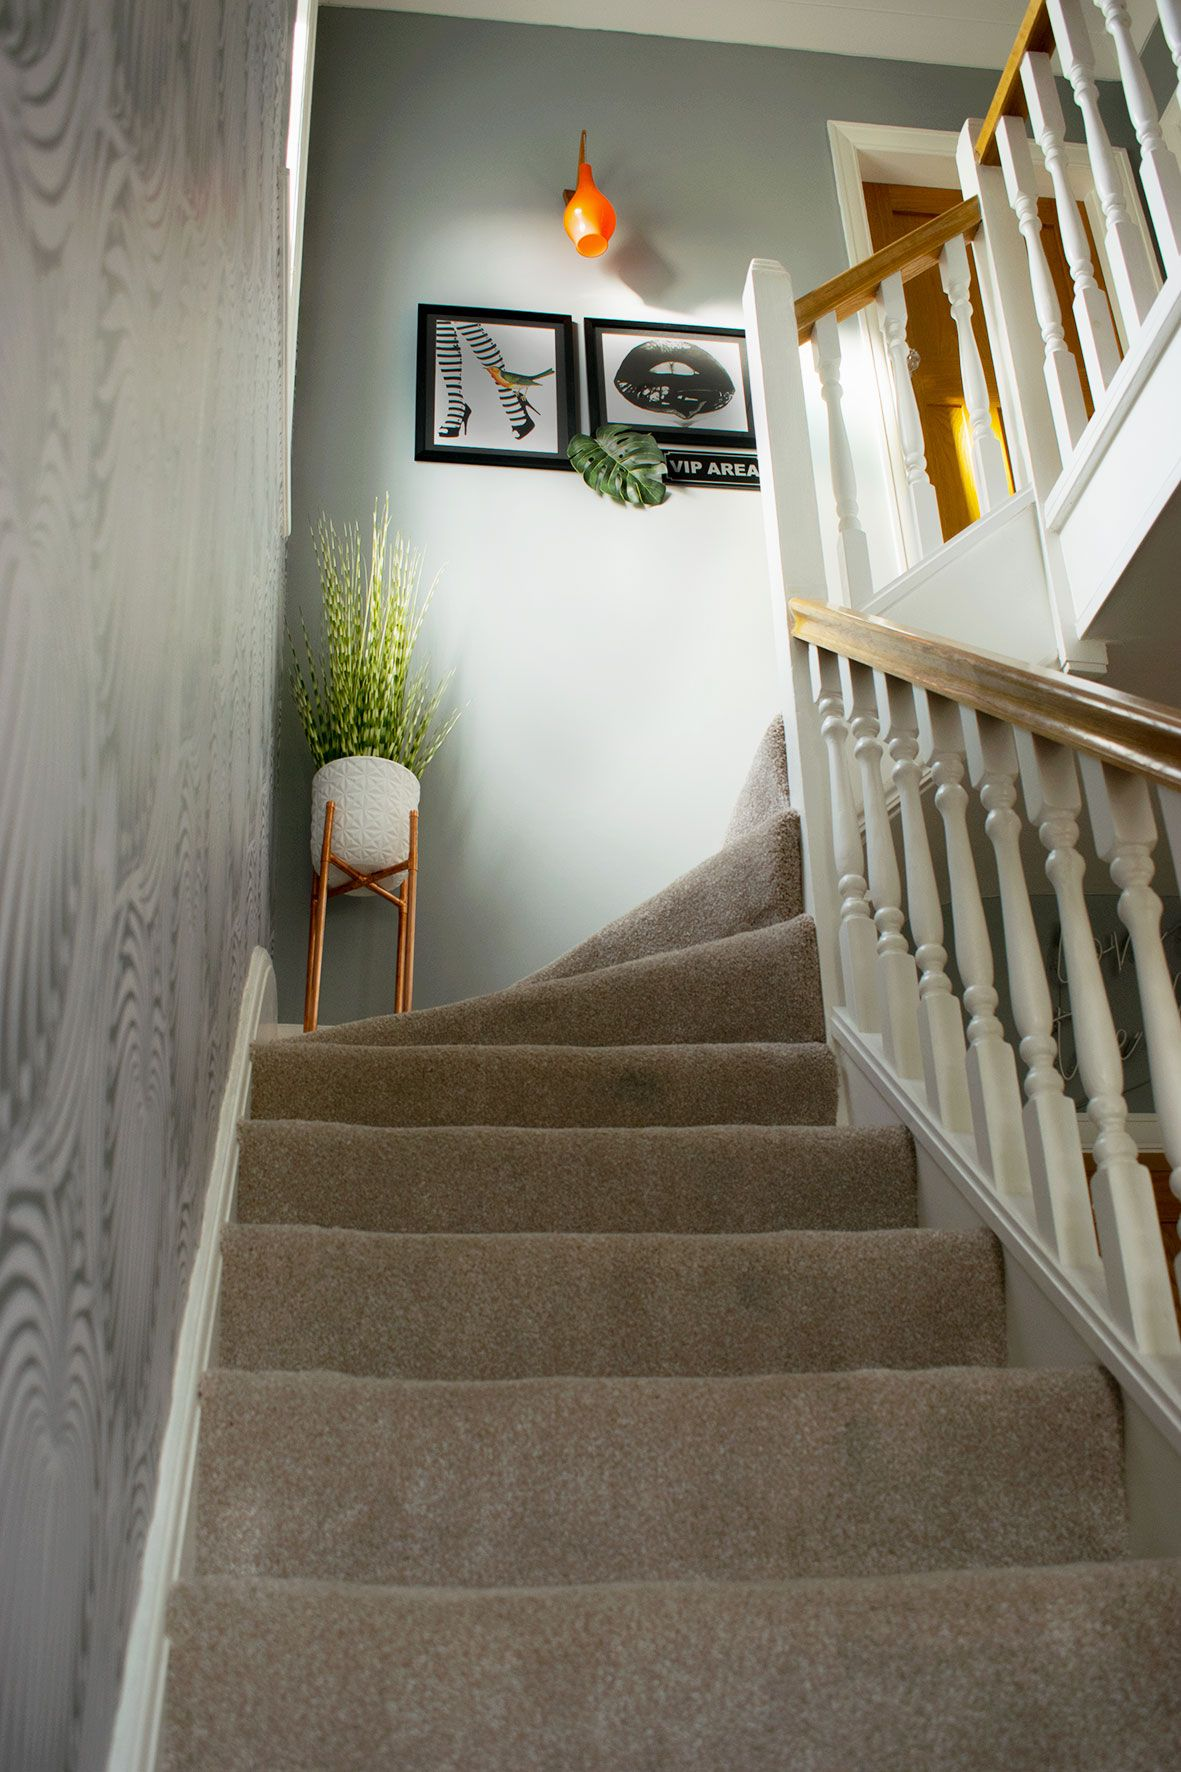 Hallway Refresh Entrance And Landing Mini Makeover Caradise Stair Decor Hallway Designs Stair Landing Decor